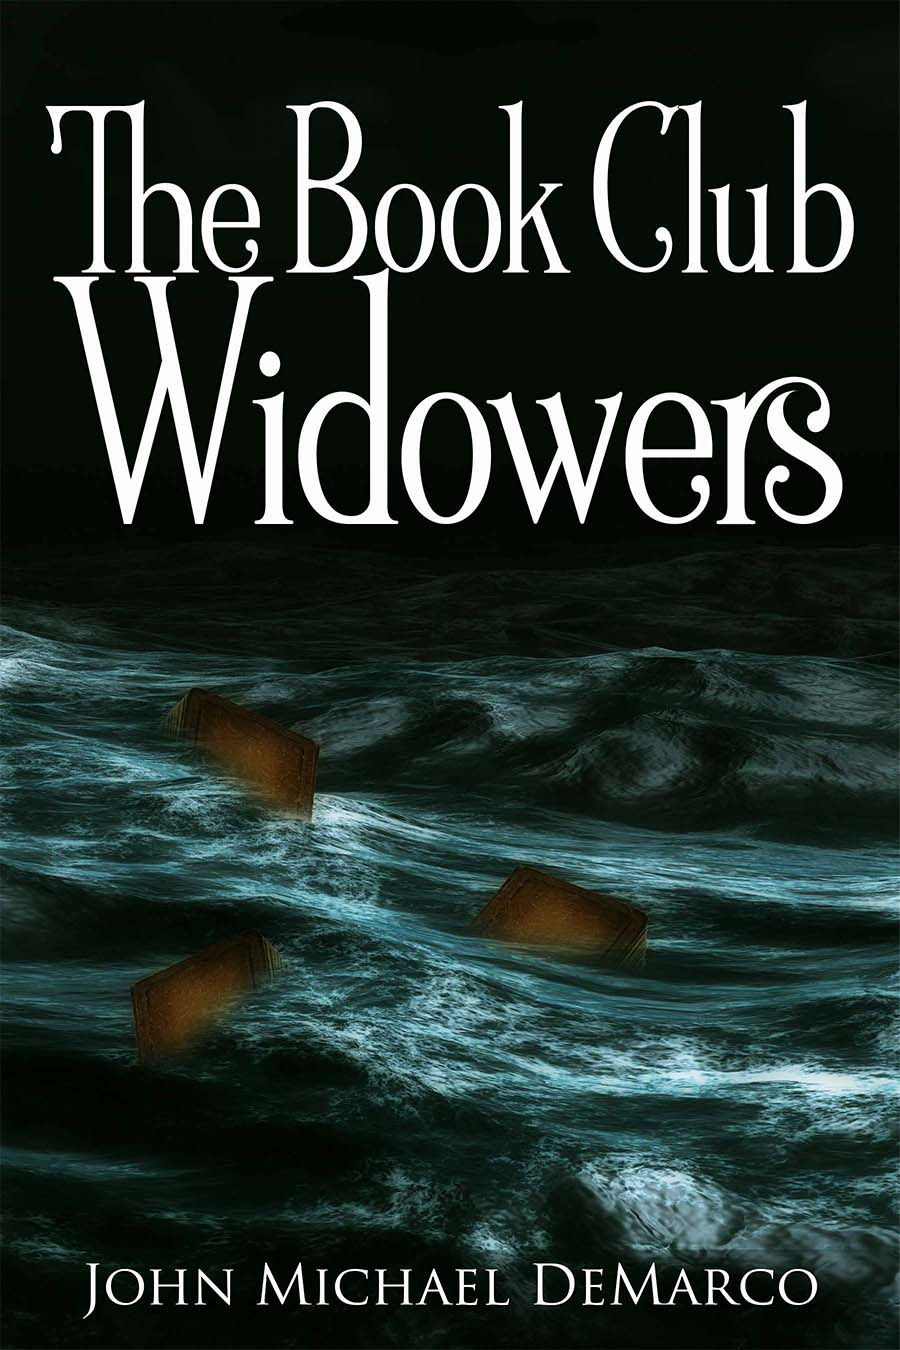 The Book Club Widowers by John Michael DeMarco